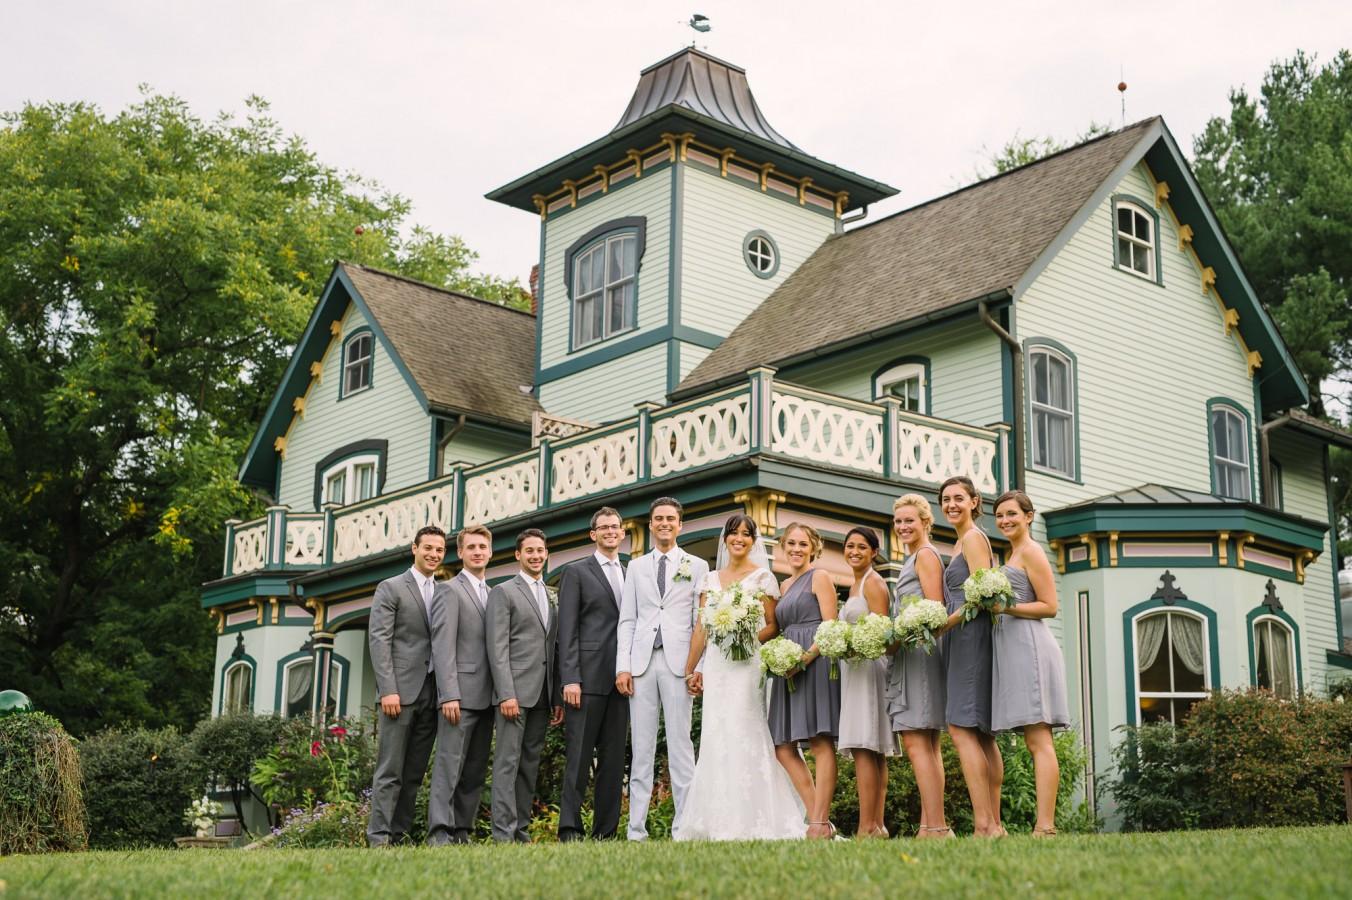 mountain-magnolia-inn-wedding-martha-stewart-1